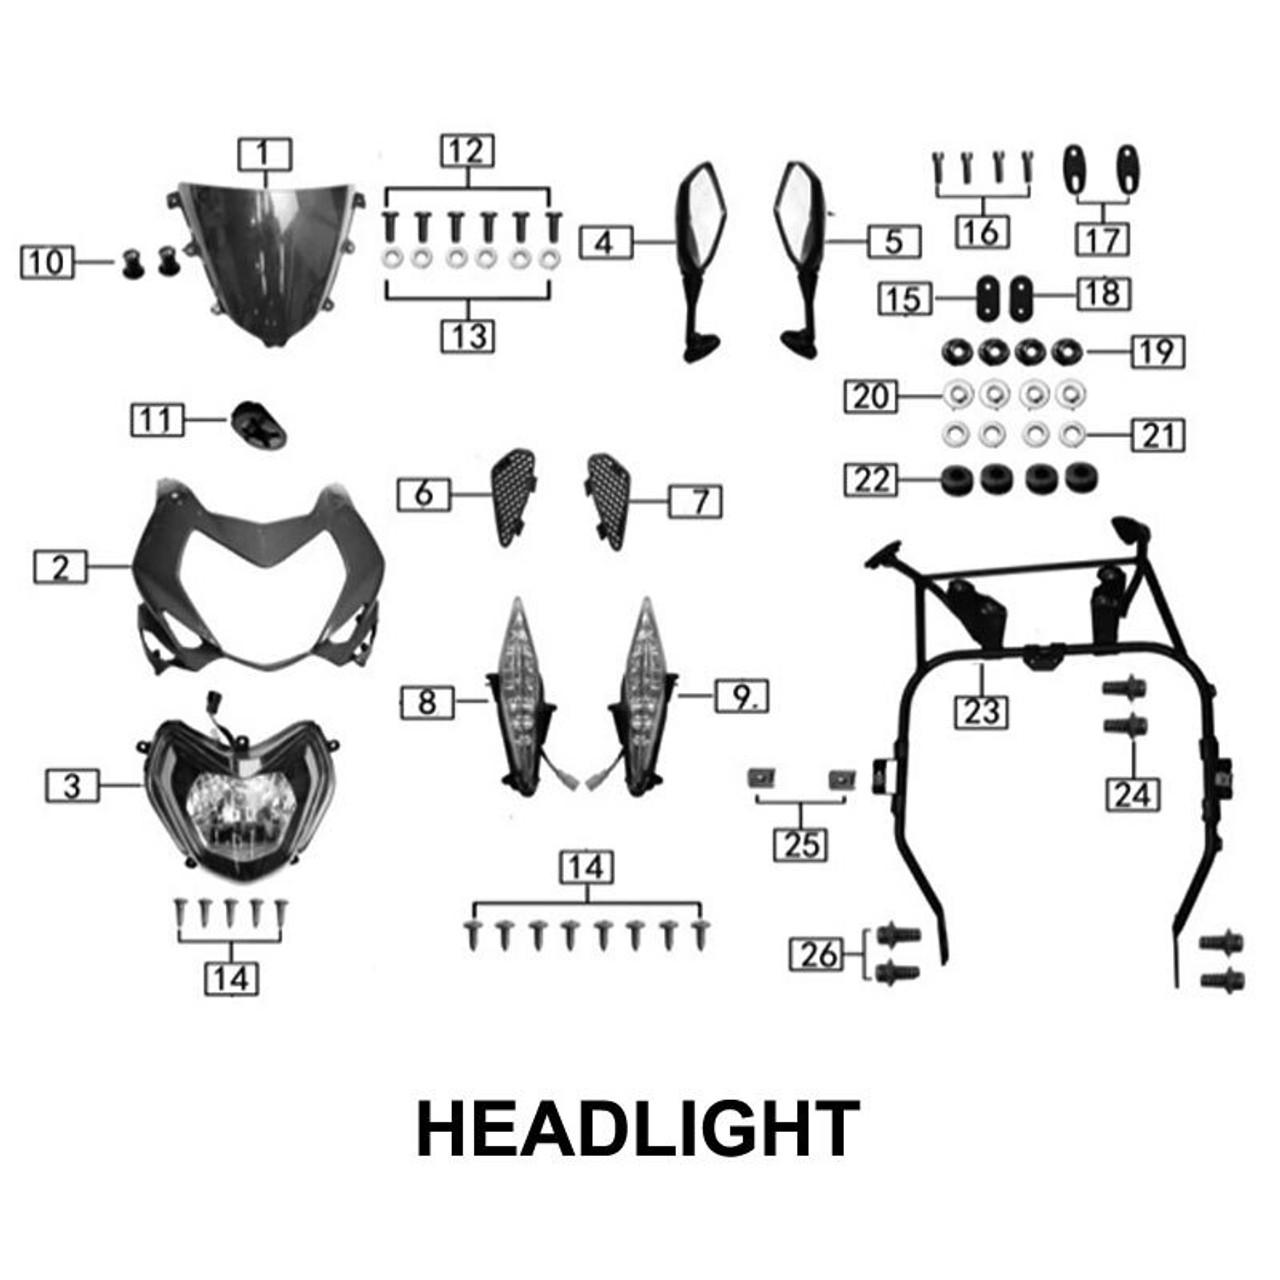 HEADLIGHT / UPPER FAIRING